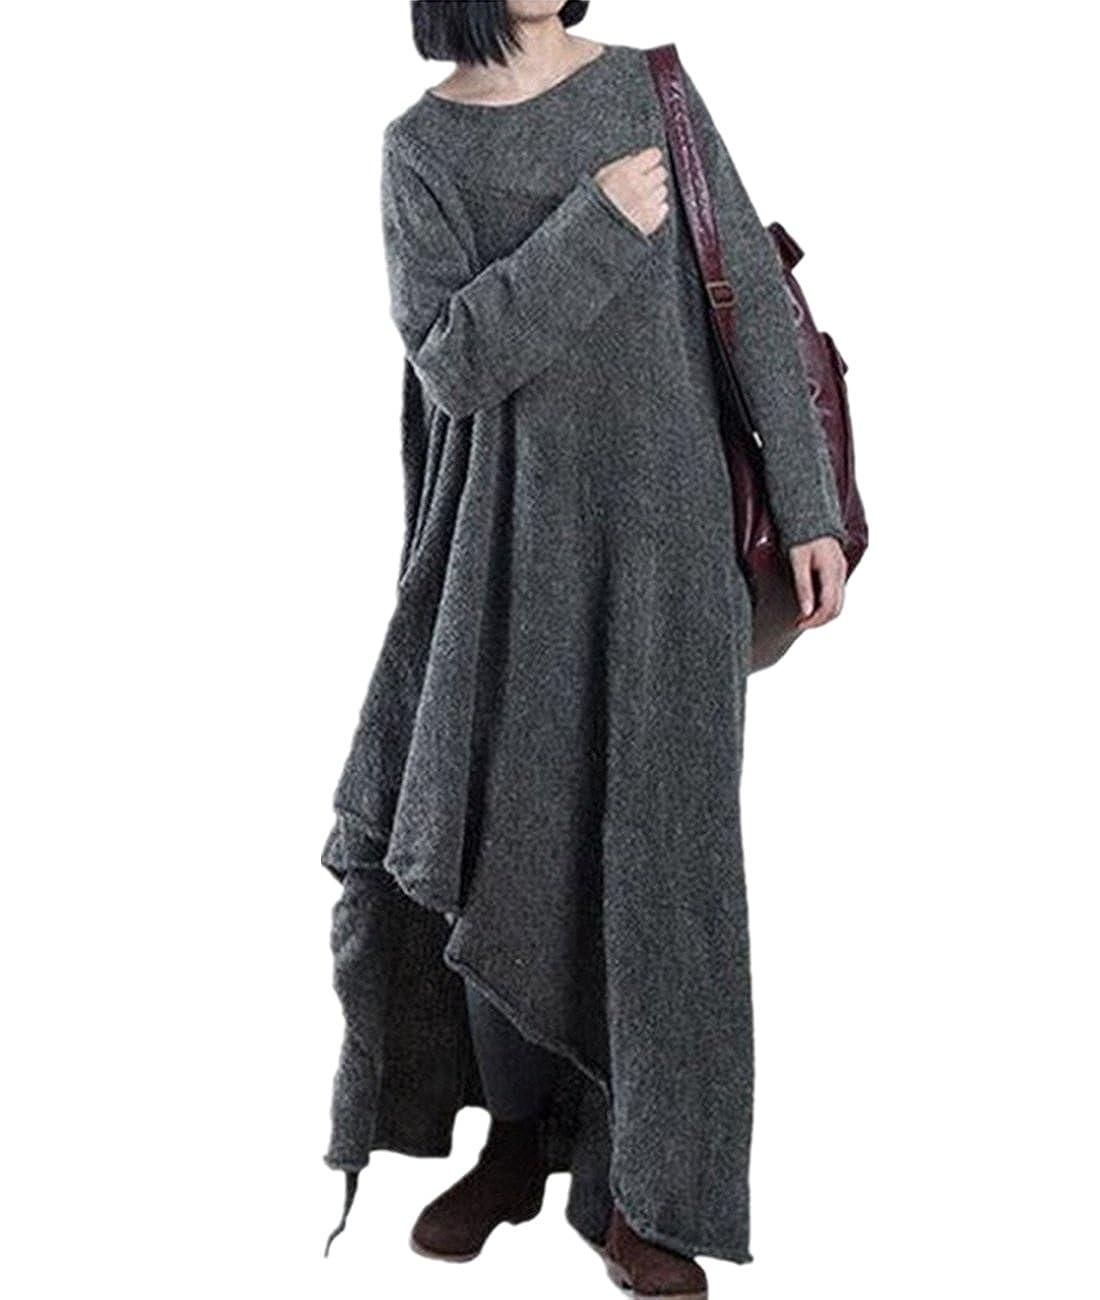 87c10e6a5a15 YESNO JT9 Women Loose Maxi Wool Knit Sweater Dress Pullover Asymmetric Hem  Long Sleeve at Amazon Women s Clothing store